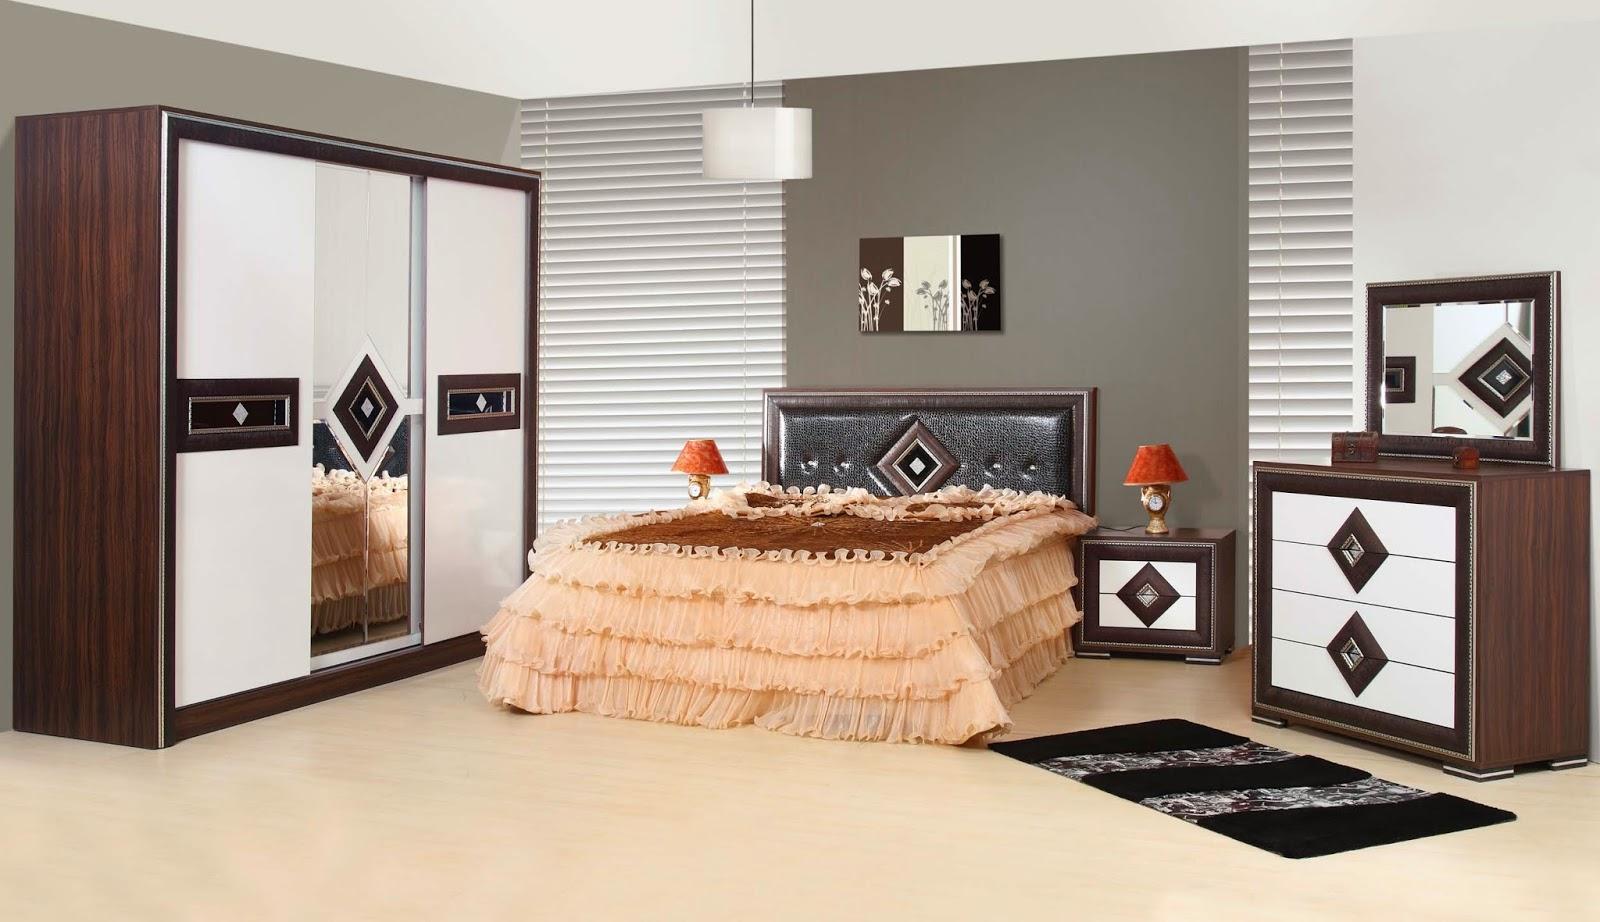 Modern stil yatak odas dekorasyon 214 rnekleri dekorasyon tarz - Akbu Mob Lya Tasarim Dekorasyon Malat Akbu Mob Lya Yatak